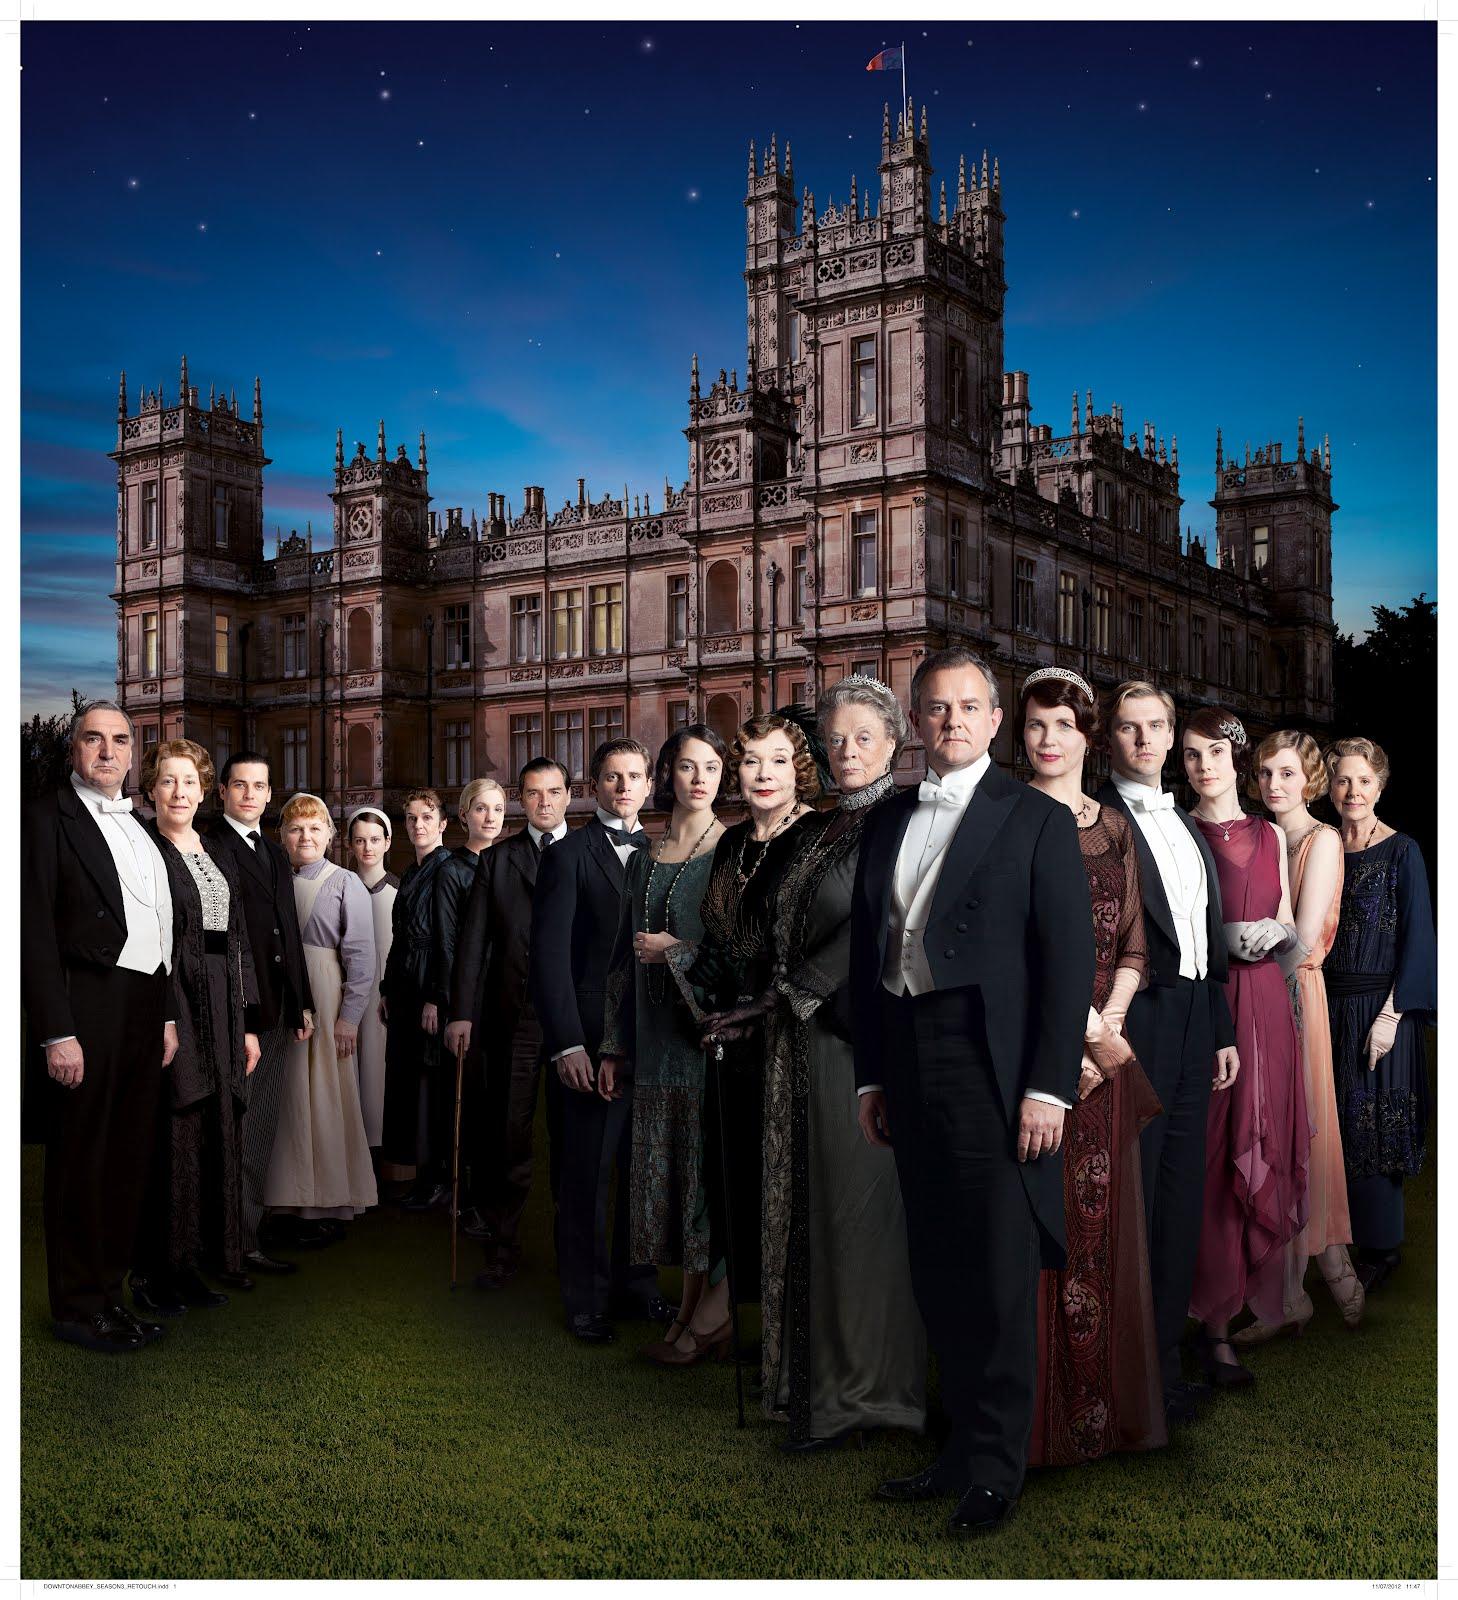 Downton Abbey by Carnival Films